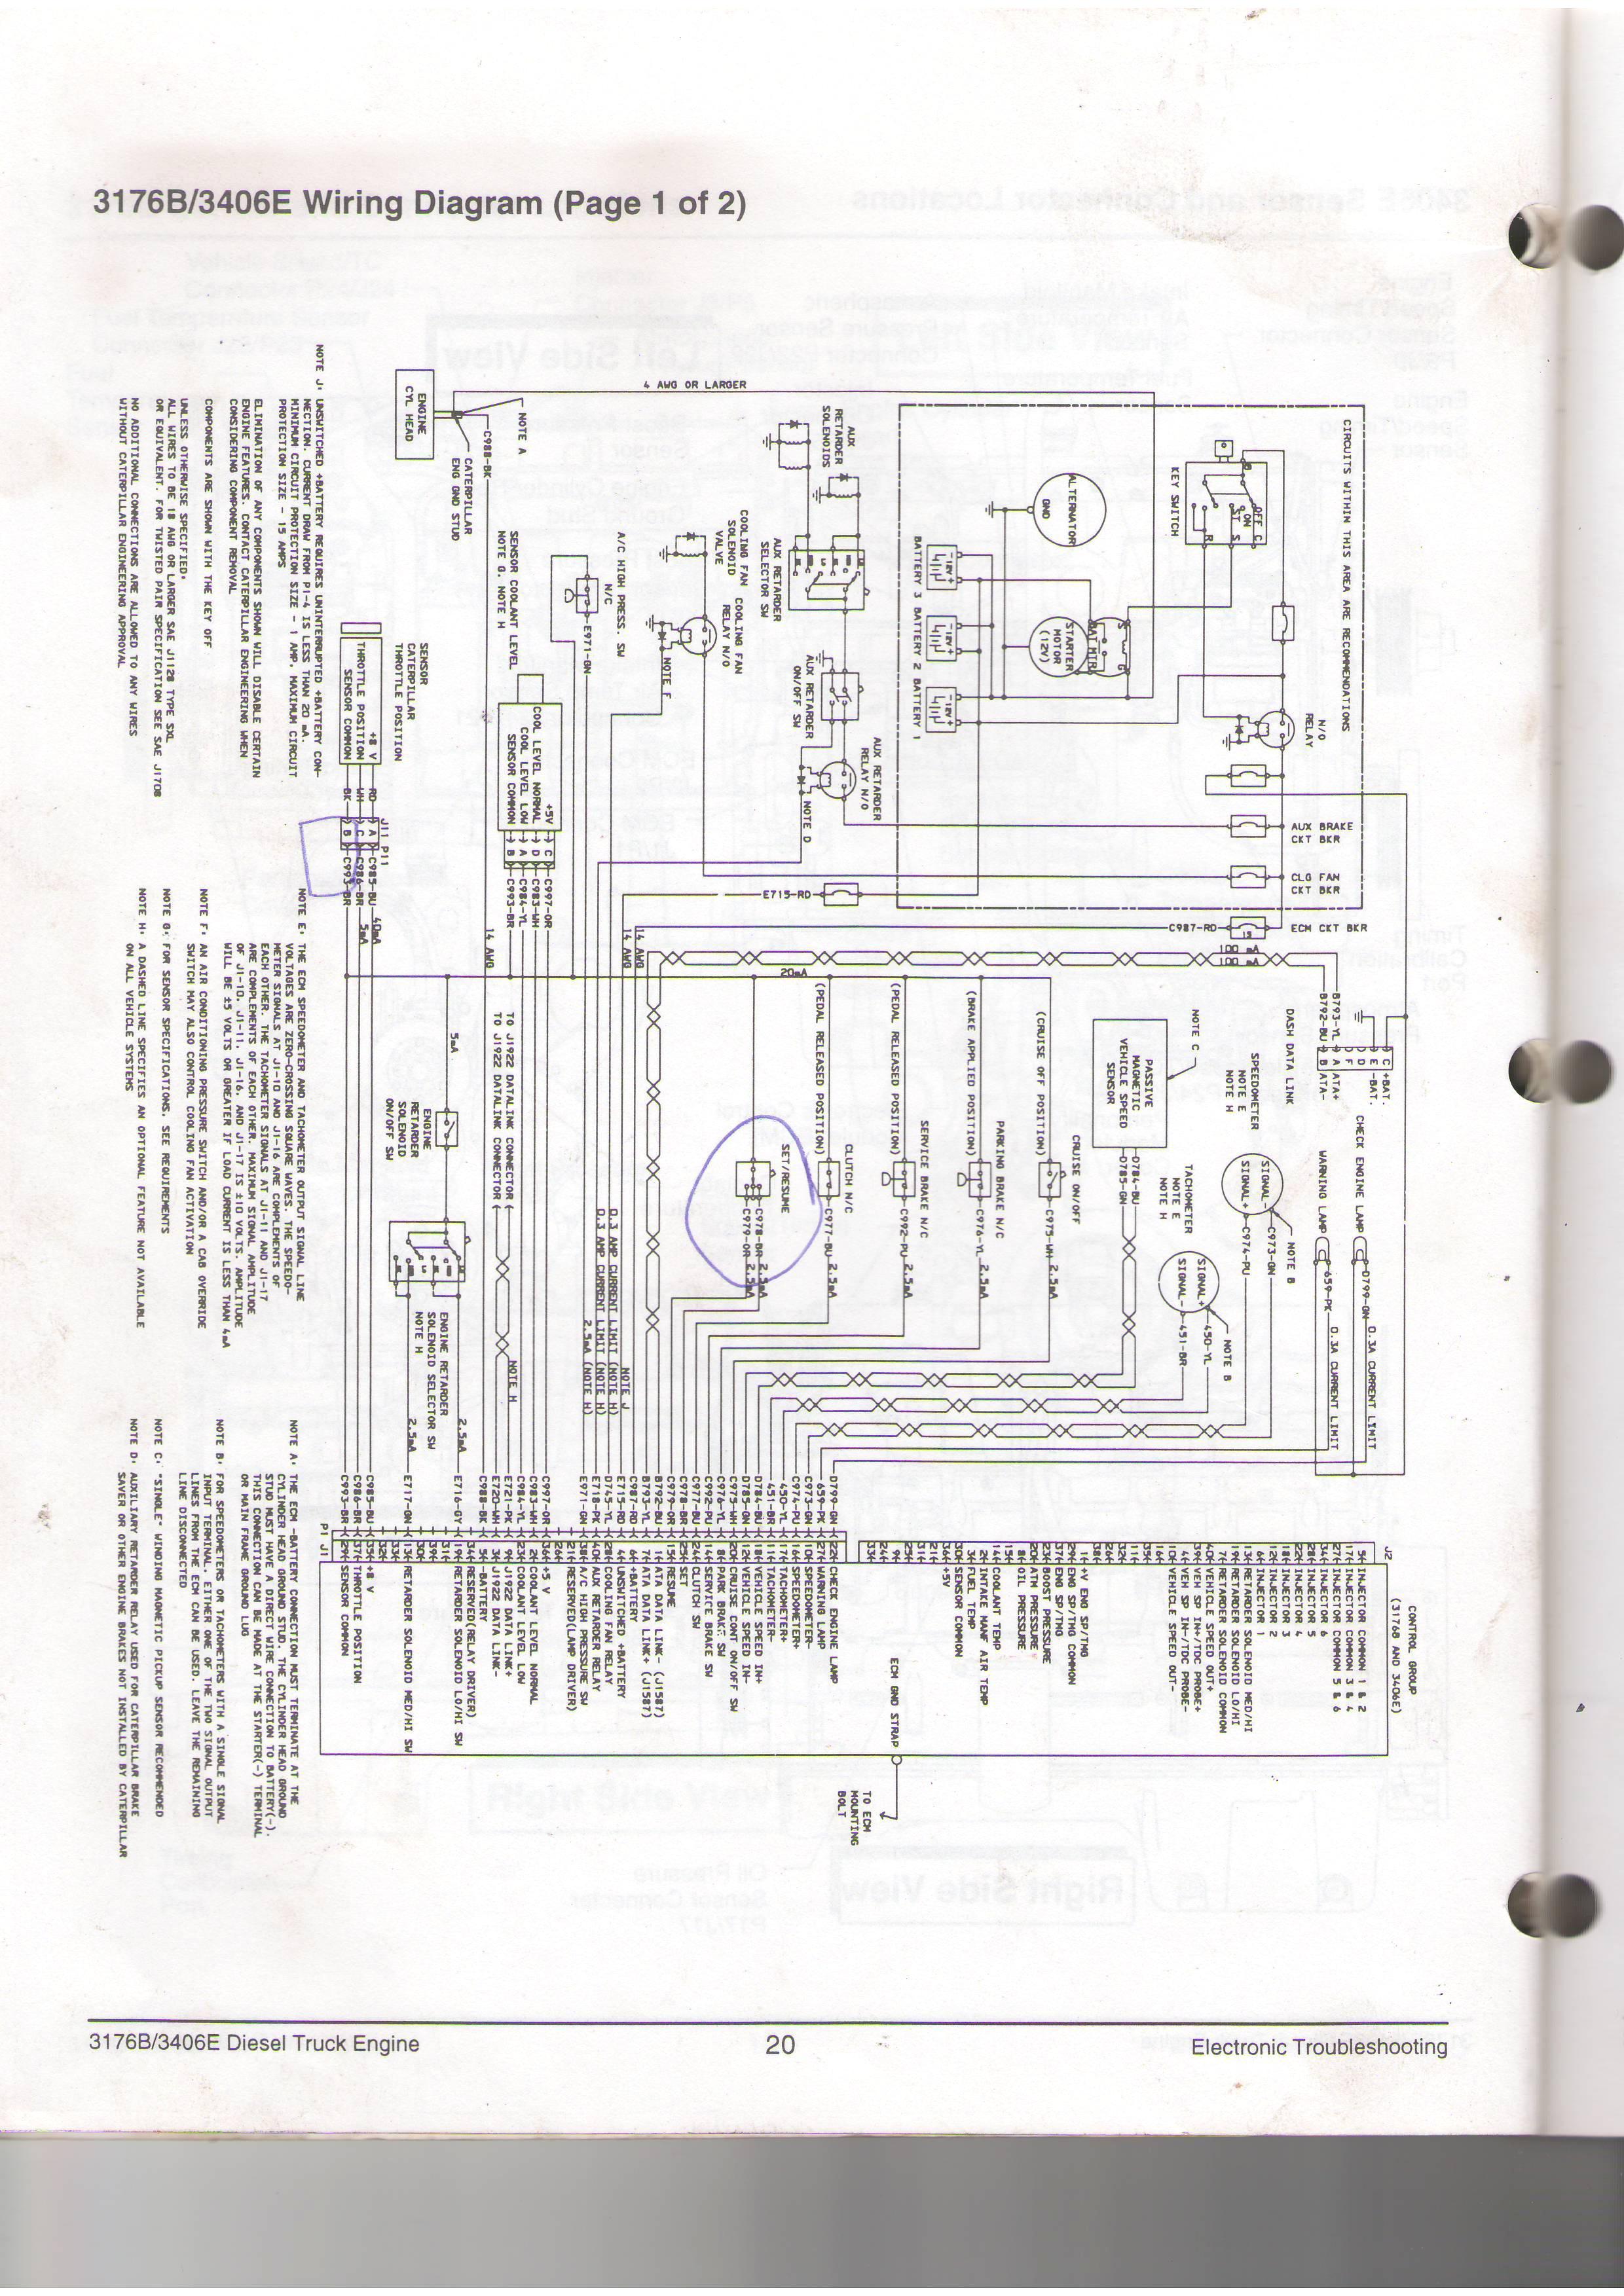 Pleasing Cat 3034 Engine Wiring Diagram General Wiring Diagram Data Wiring Cloud Licukaidewilluminateatxorg